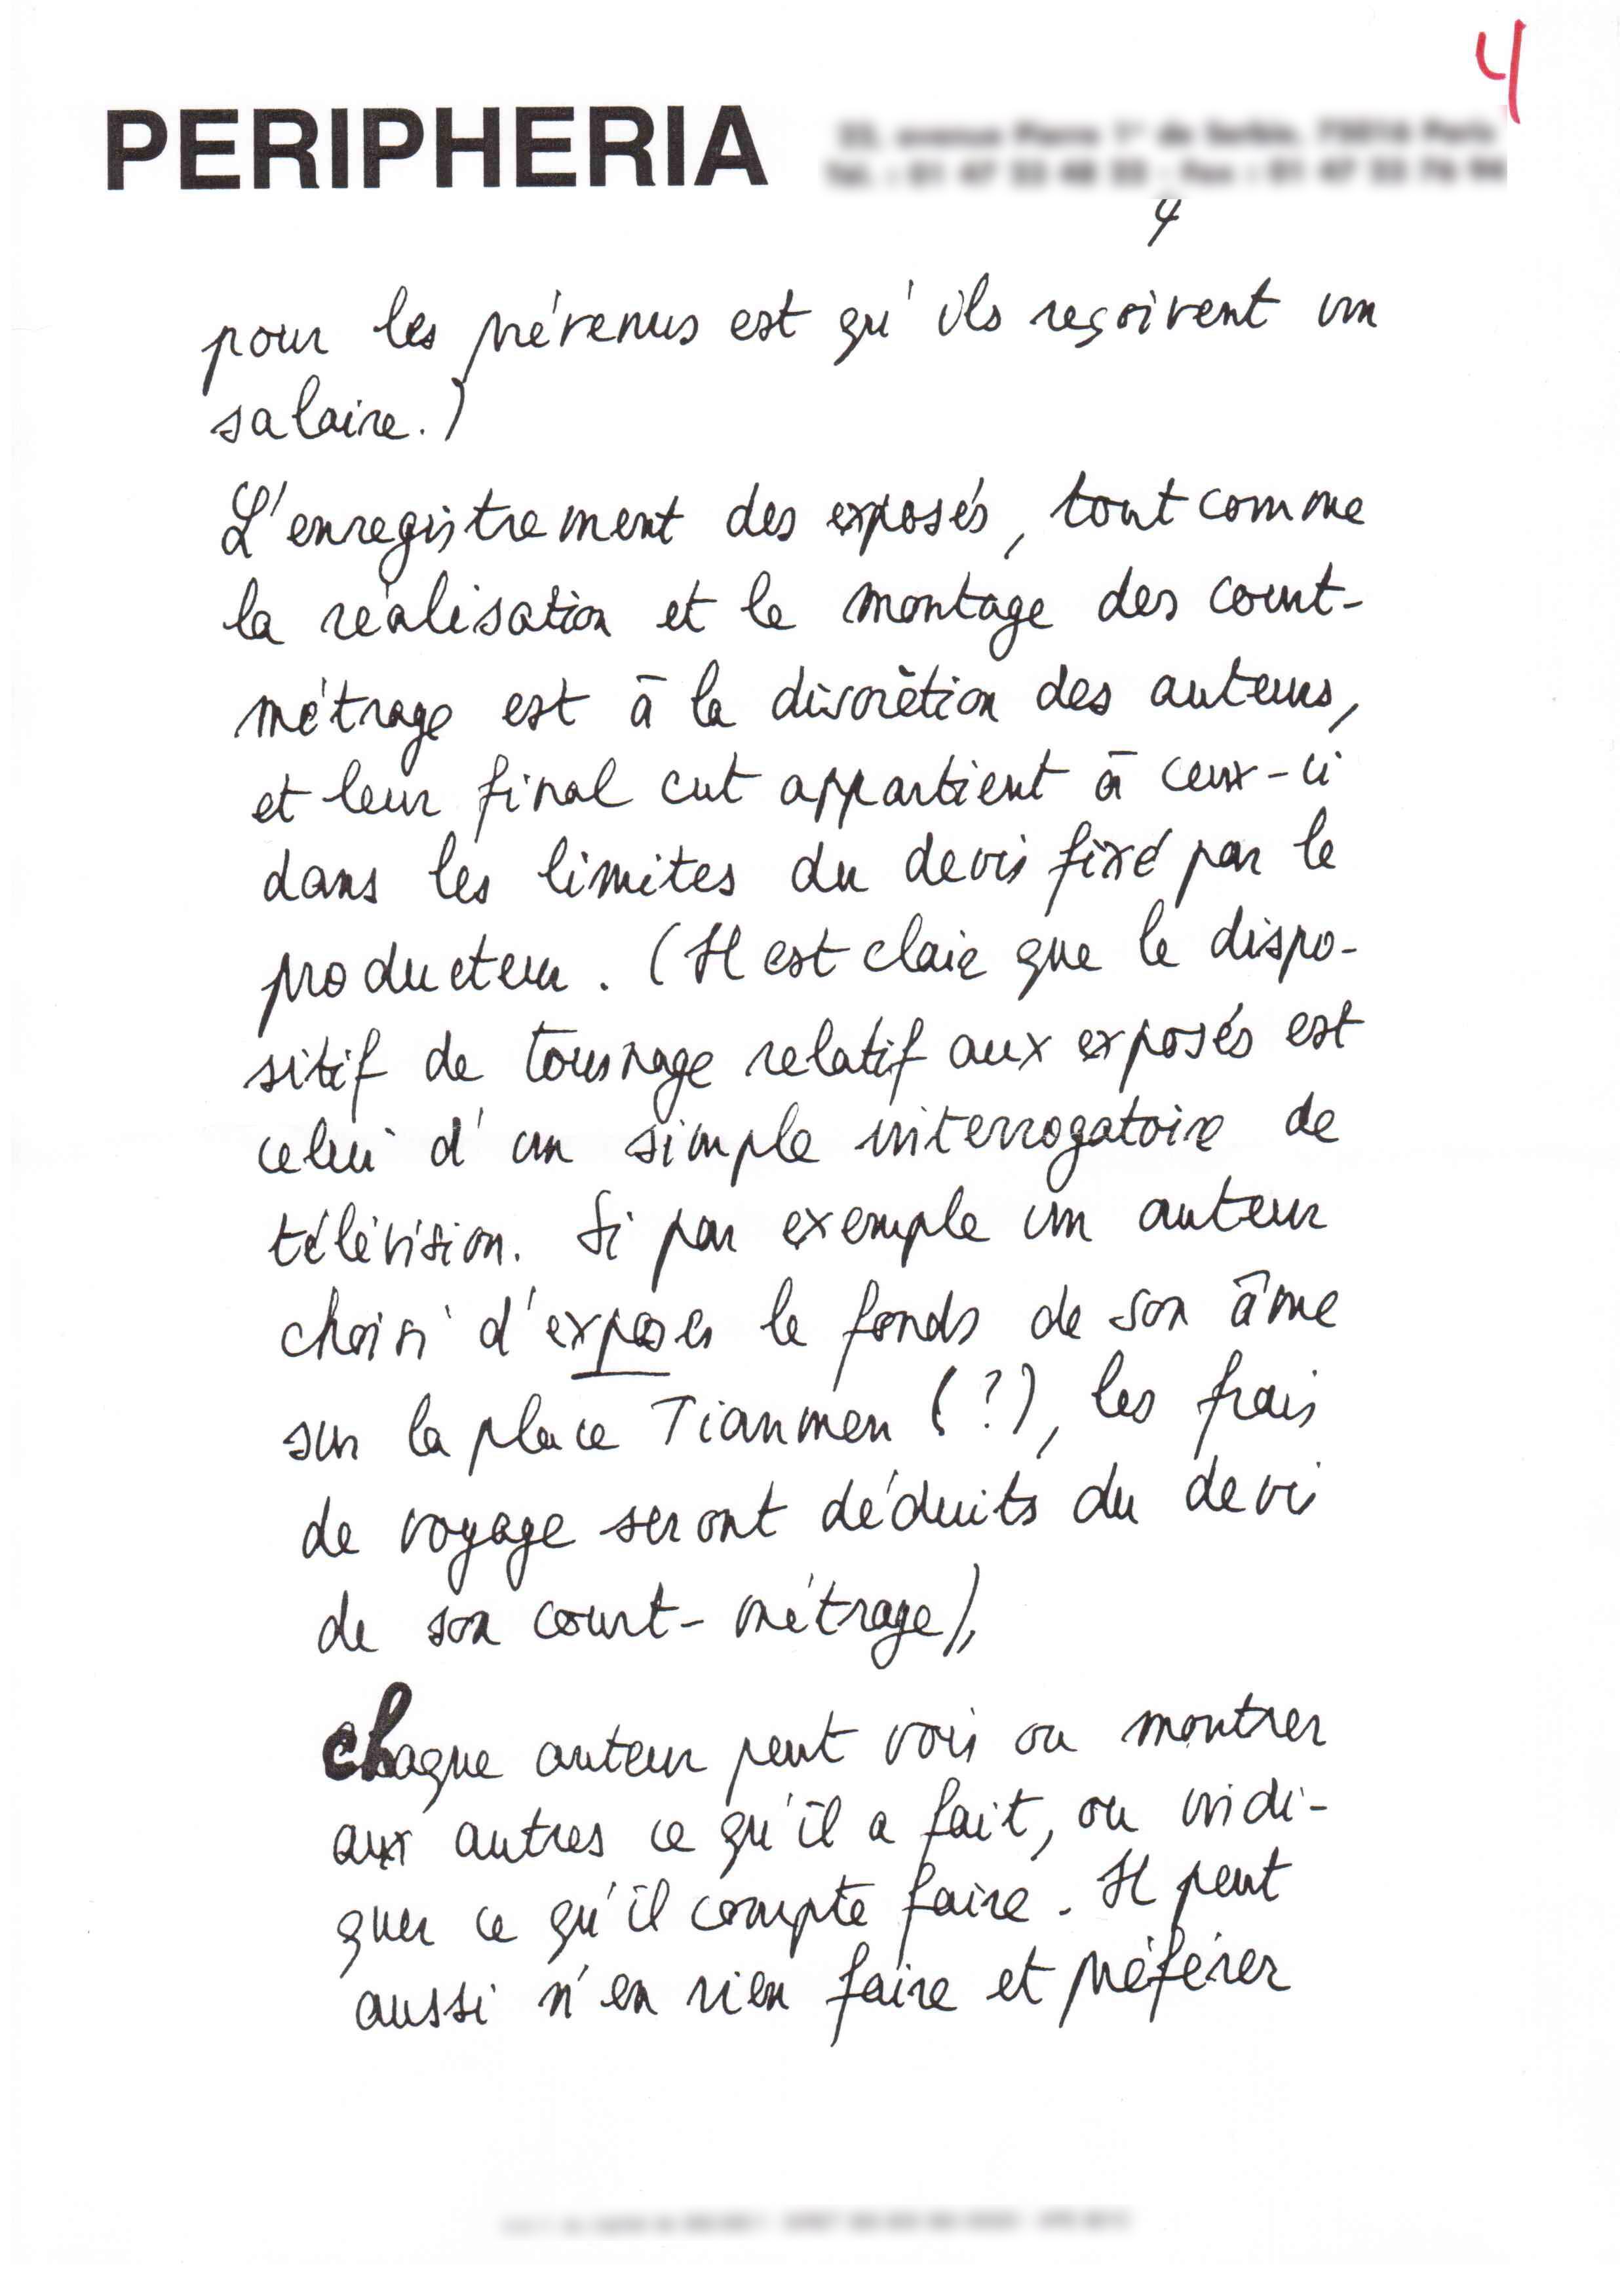 Document 4, partie 4